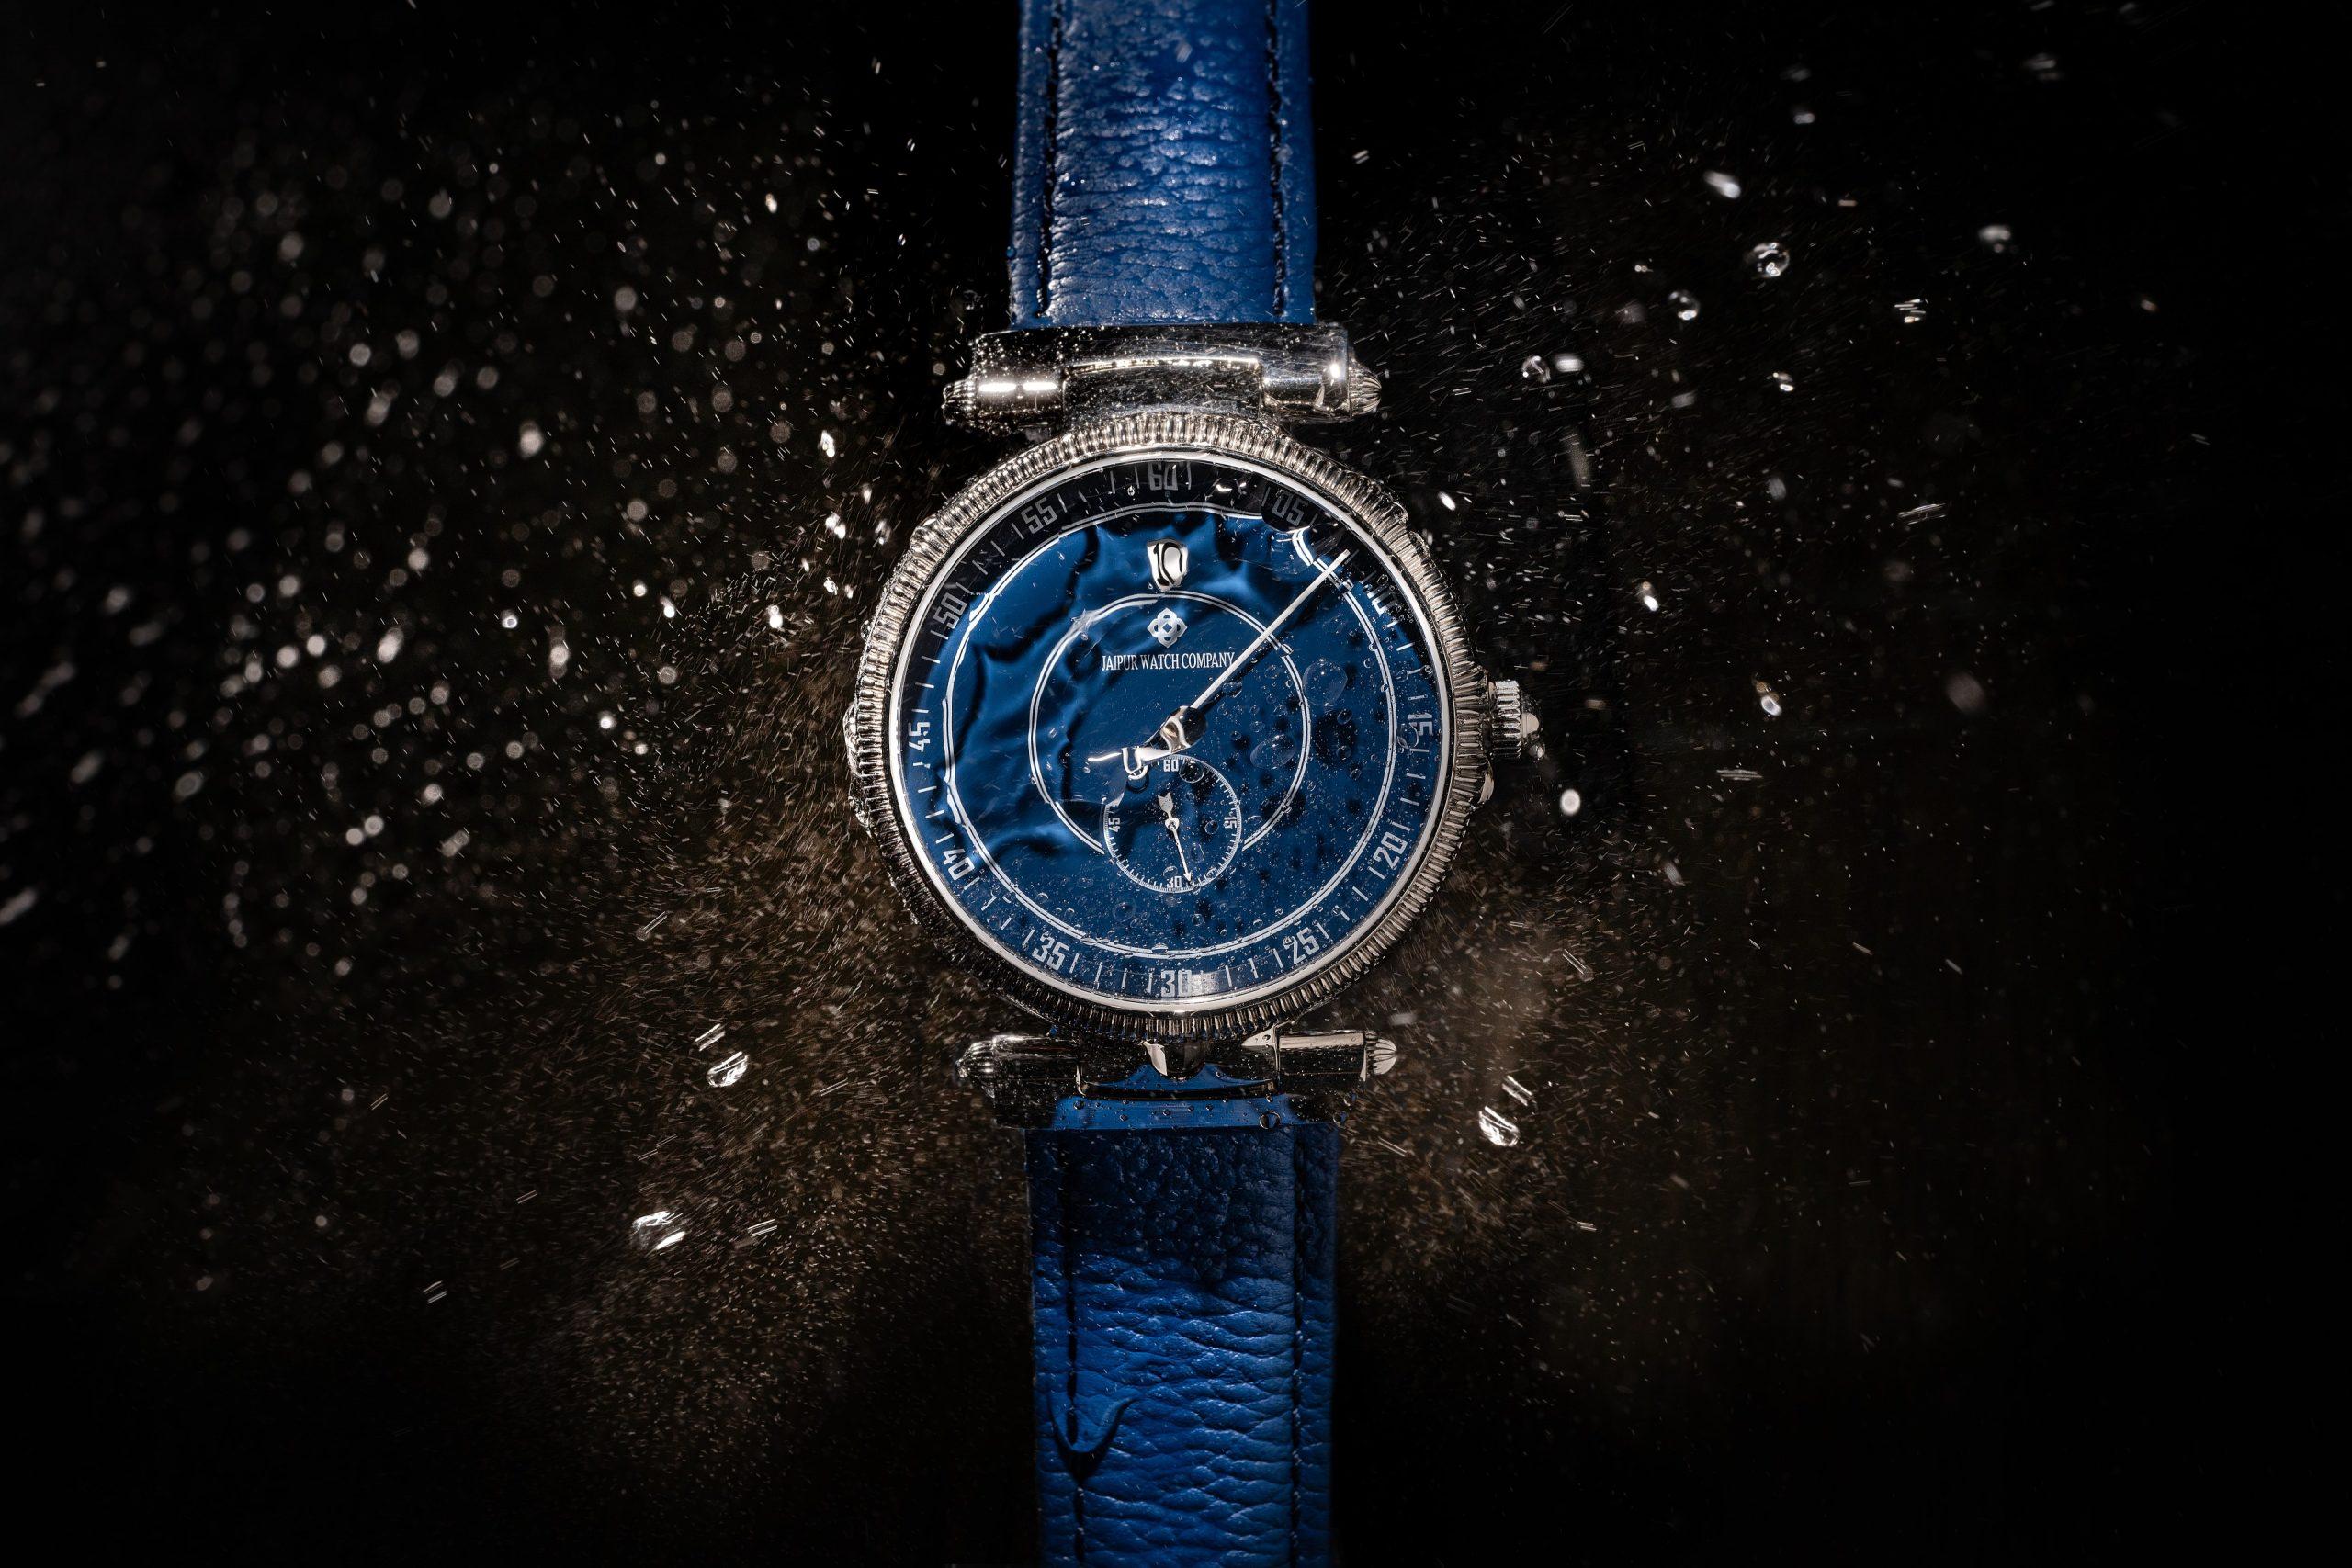 Jump Hour Watch, Jaipur Watch Company